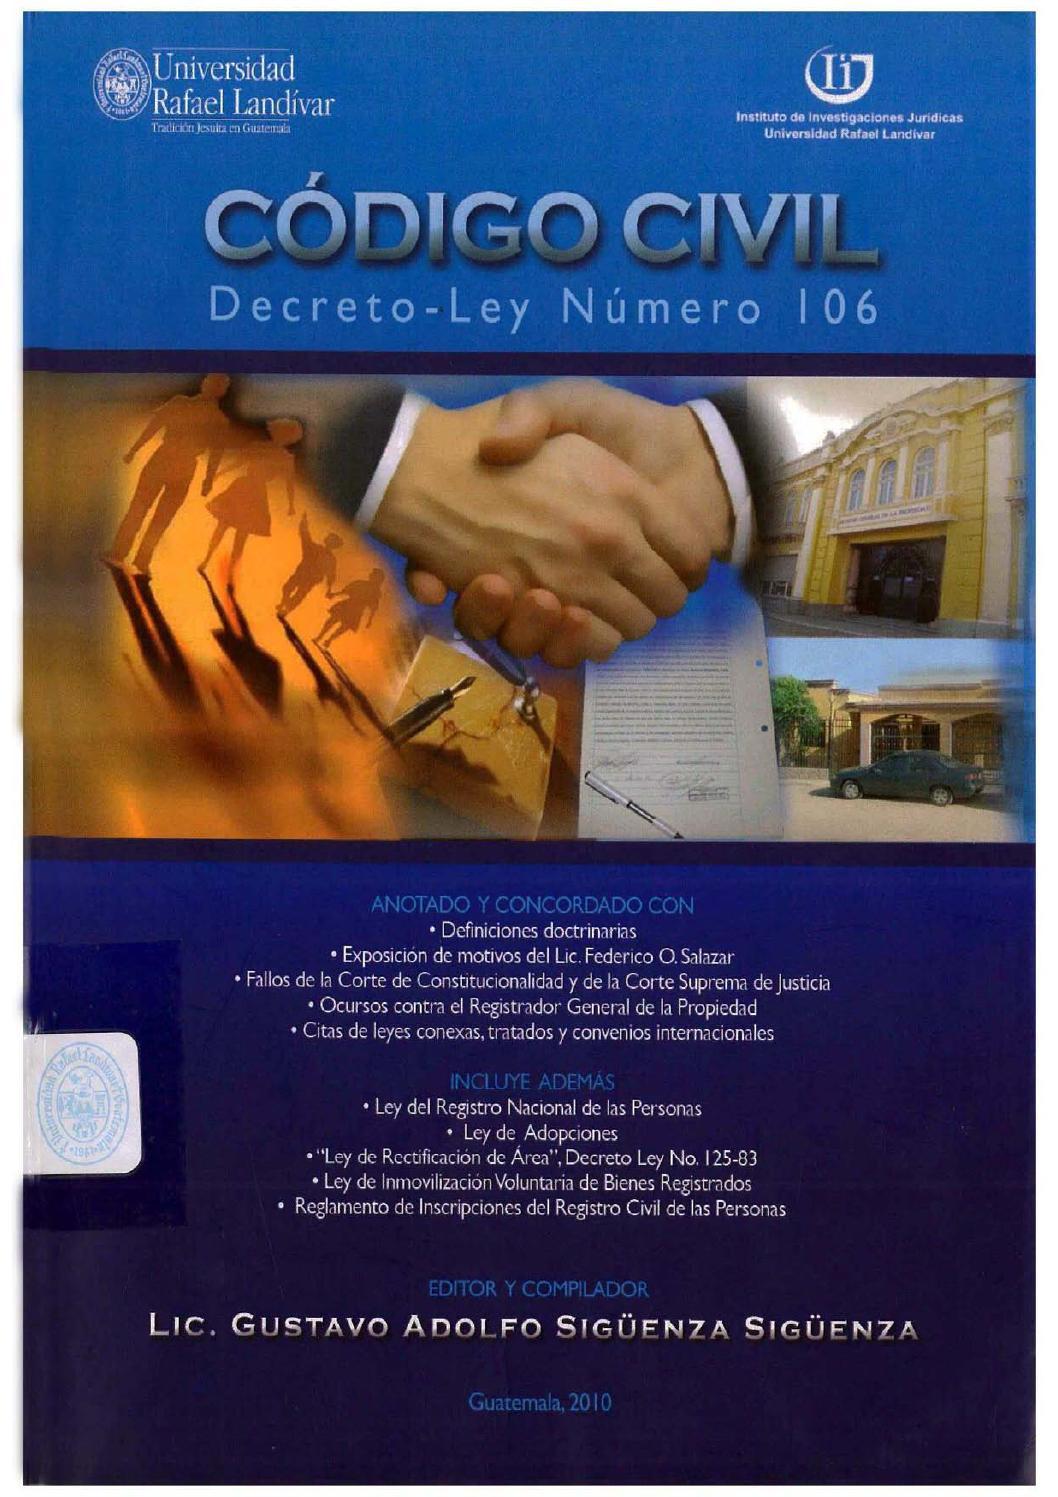 Codigo civil pdfd by Recursos Humanos - issuu